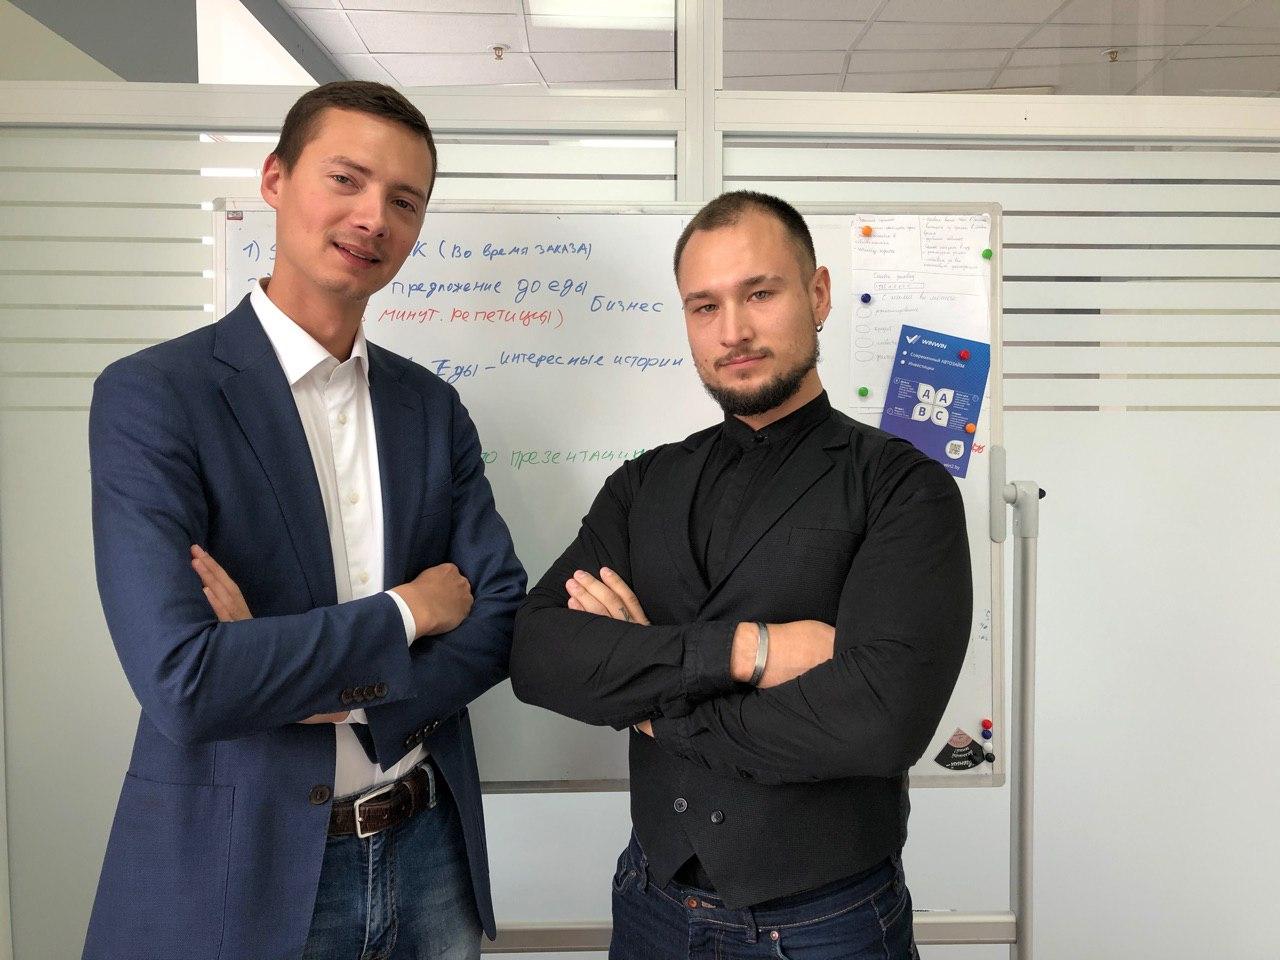 Основатели Win2 Евгений Мозжухин (слева) и Ким Мазур. Фото из их личного архива